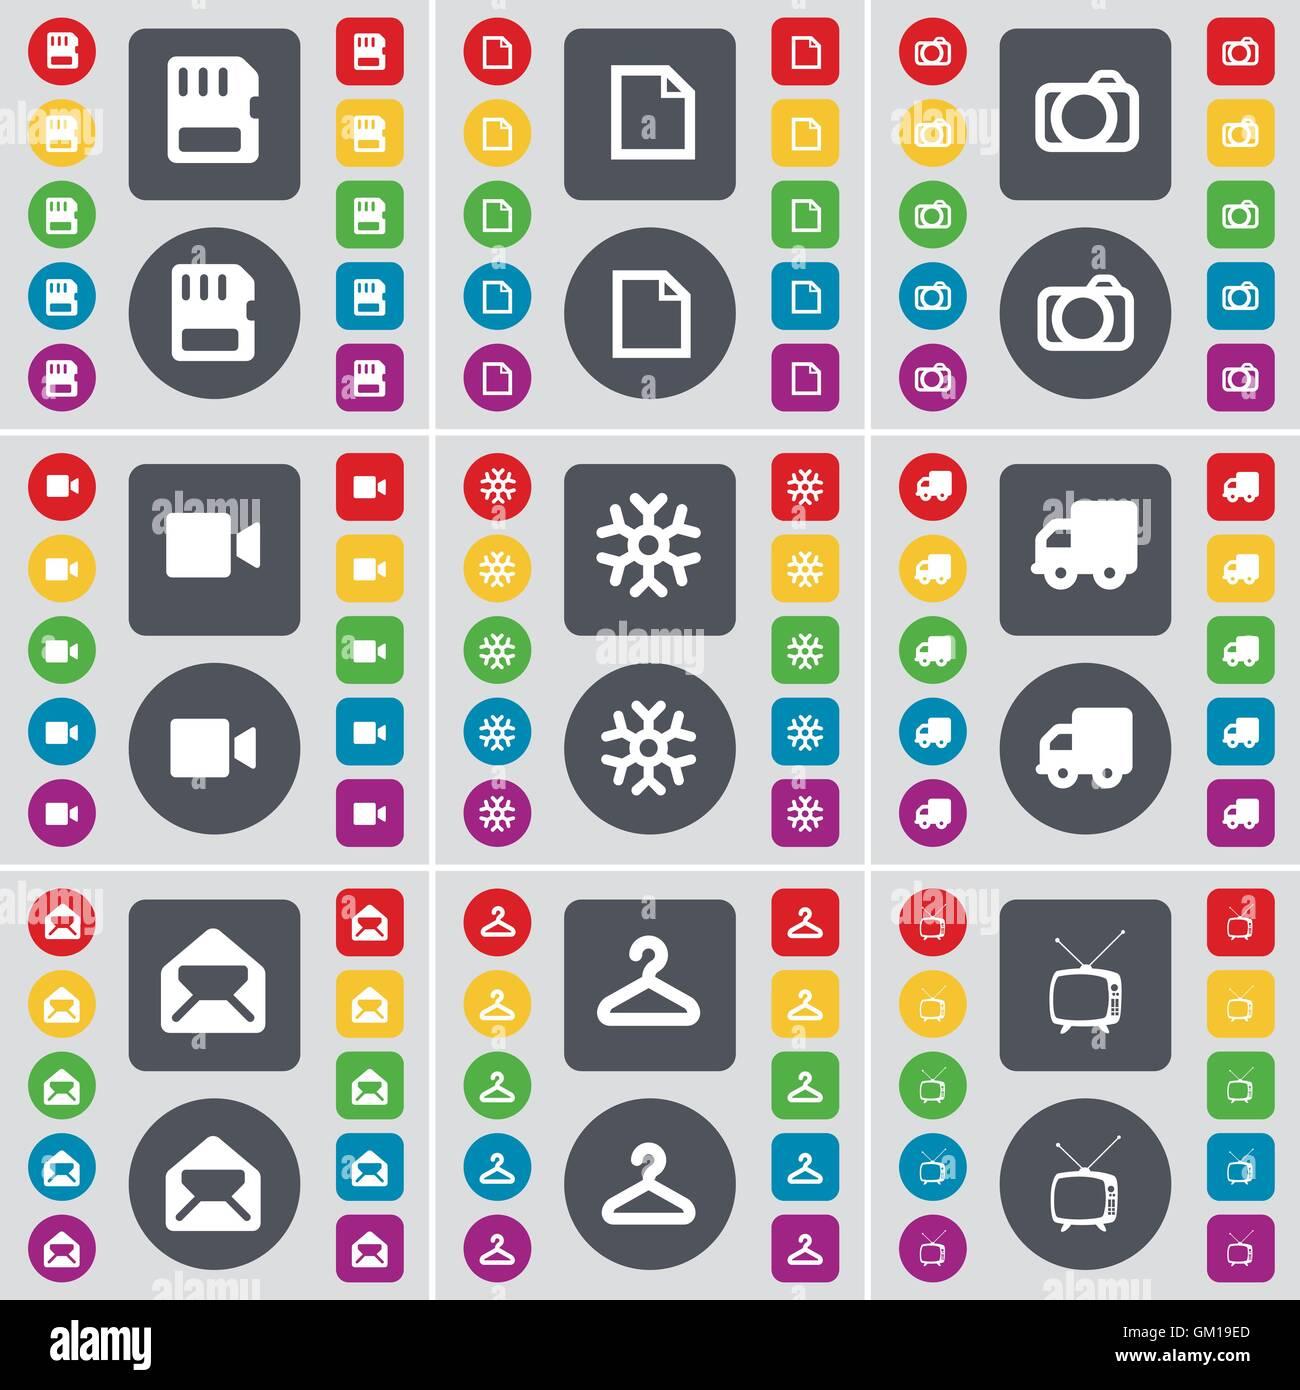 SIM card, File, Camera, Film camera, Snowflake, Truck, Message, Hanger, Retro TV icon symbol. A large set of flat, - Stock Image